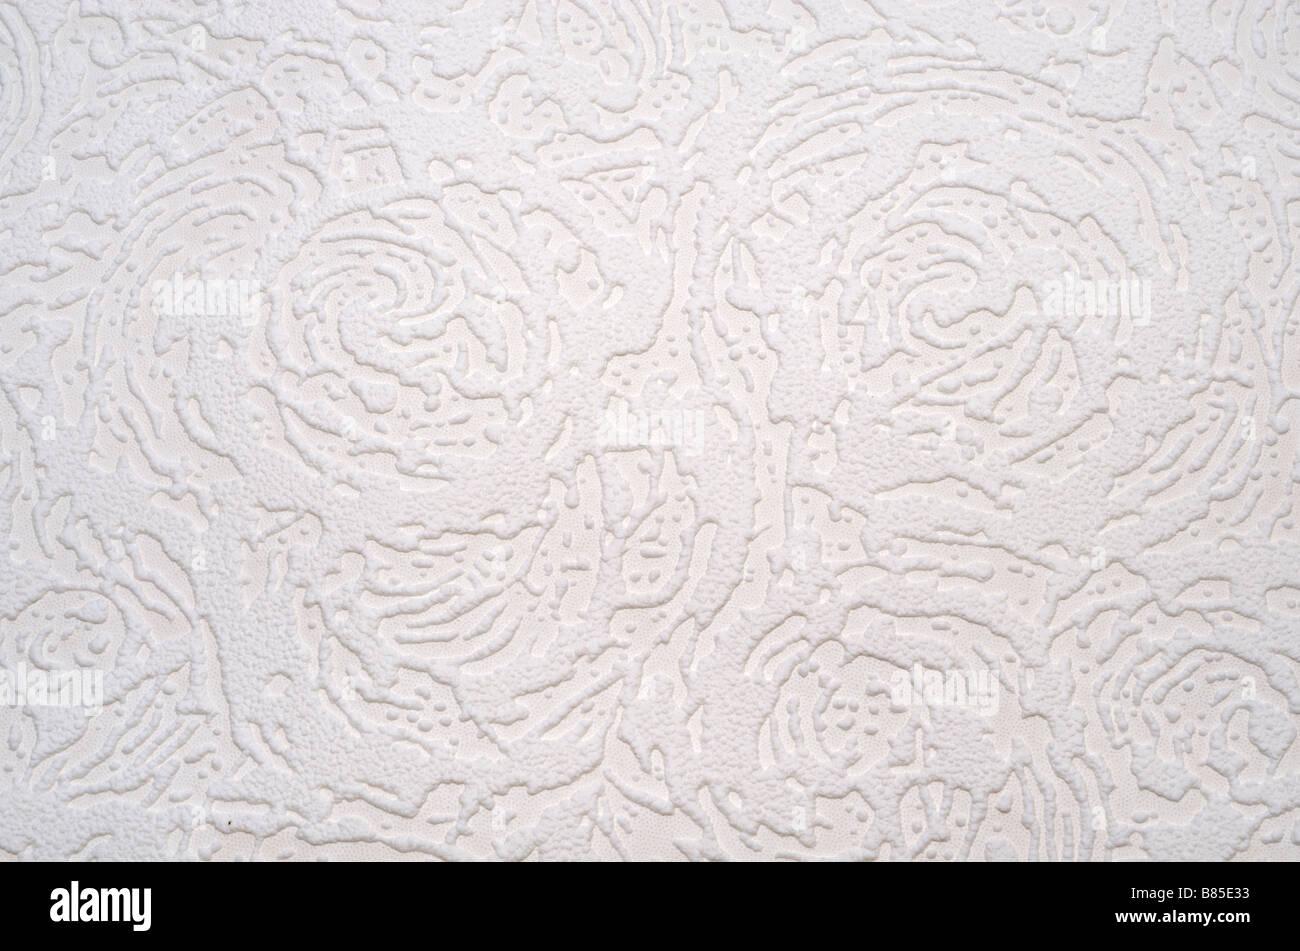 A square of Superglypta wallpaper pattern - Stock Image